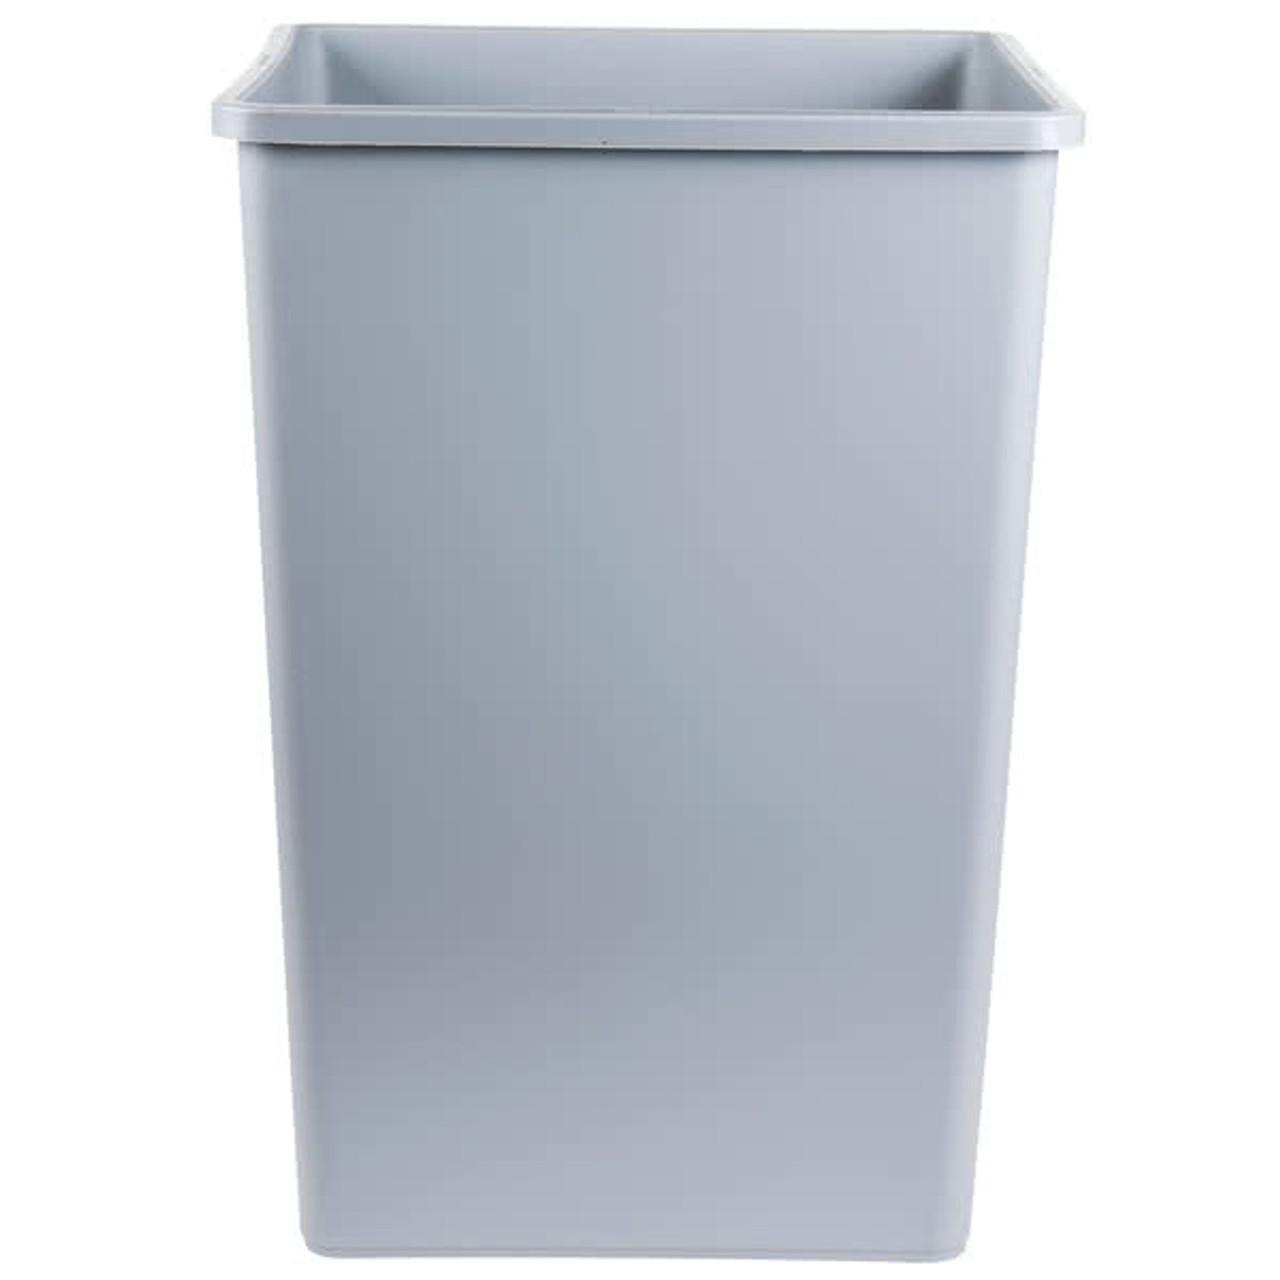 Rubbermaid Square Container 132.5 L - Grey